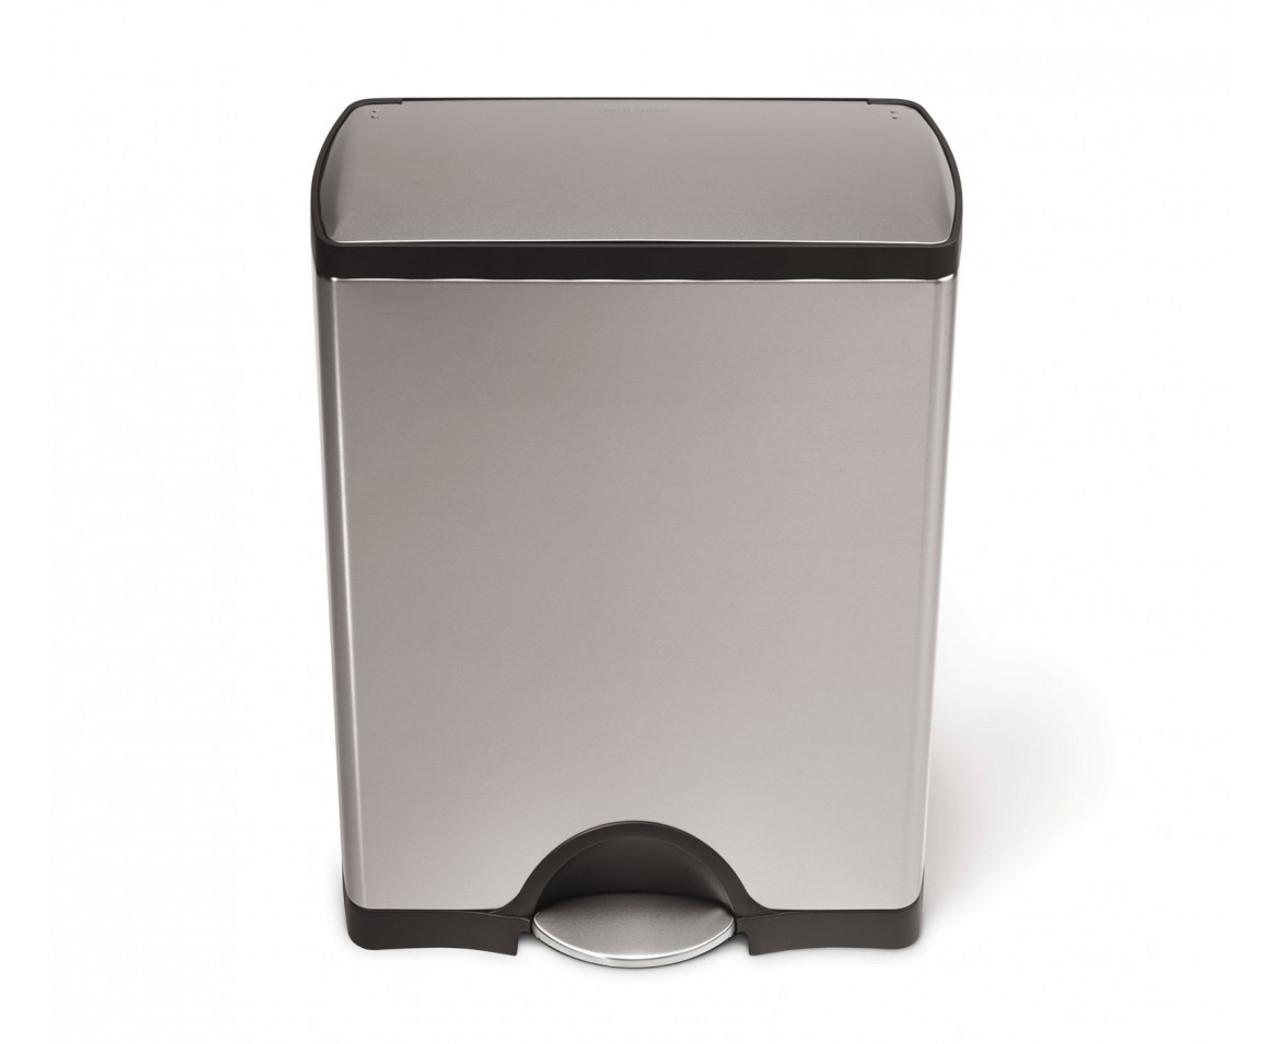 simplehuman 50 litre stainless steel rectangular kitchen bin. Black Bedroom Furniture Sets. Home Design Ideas